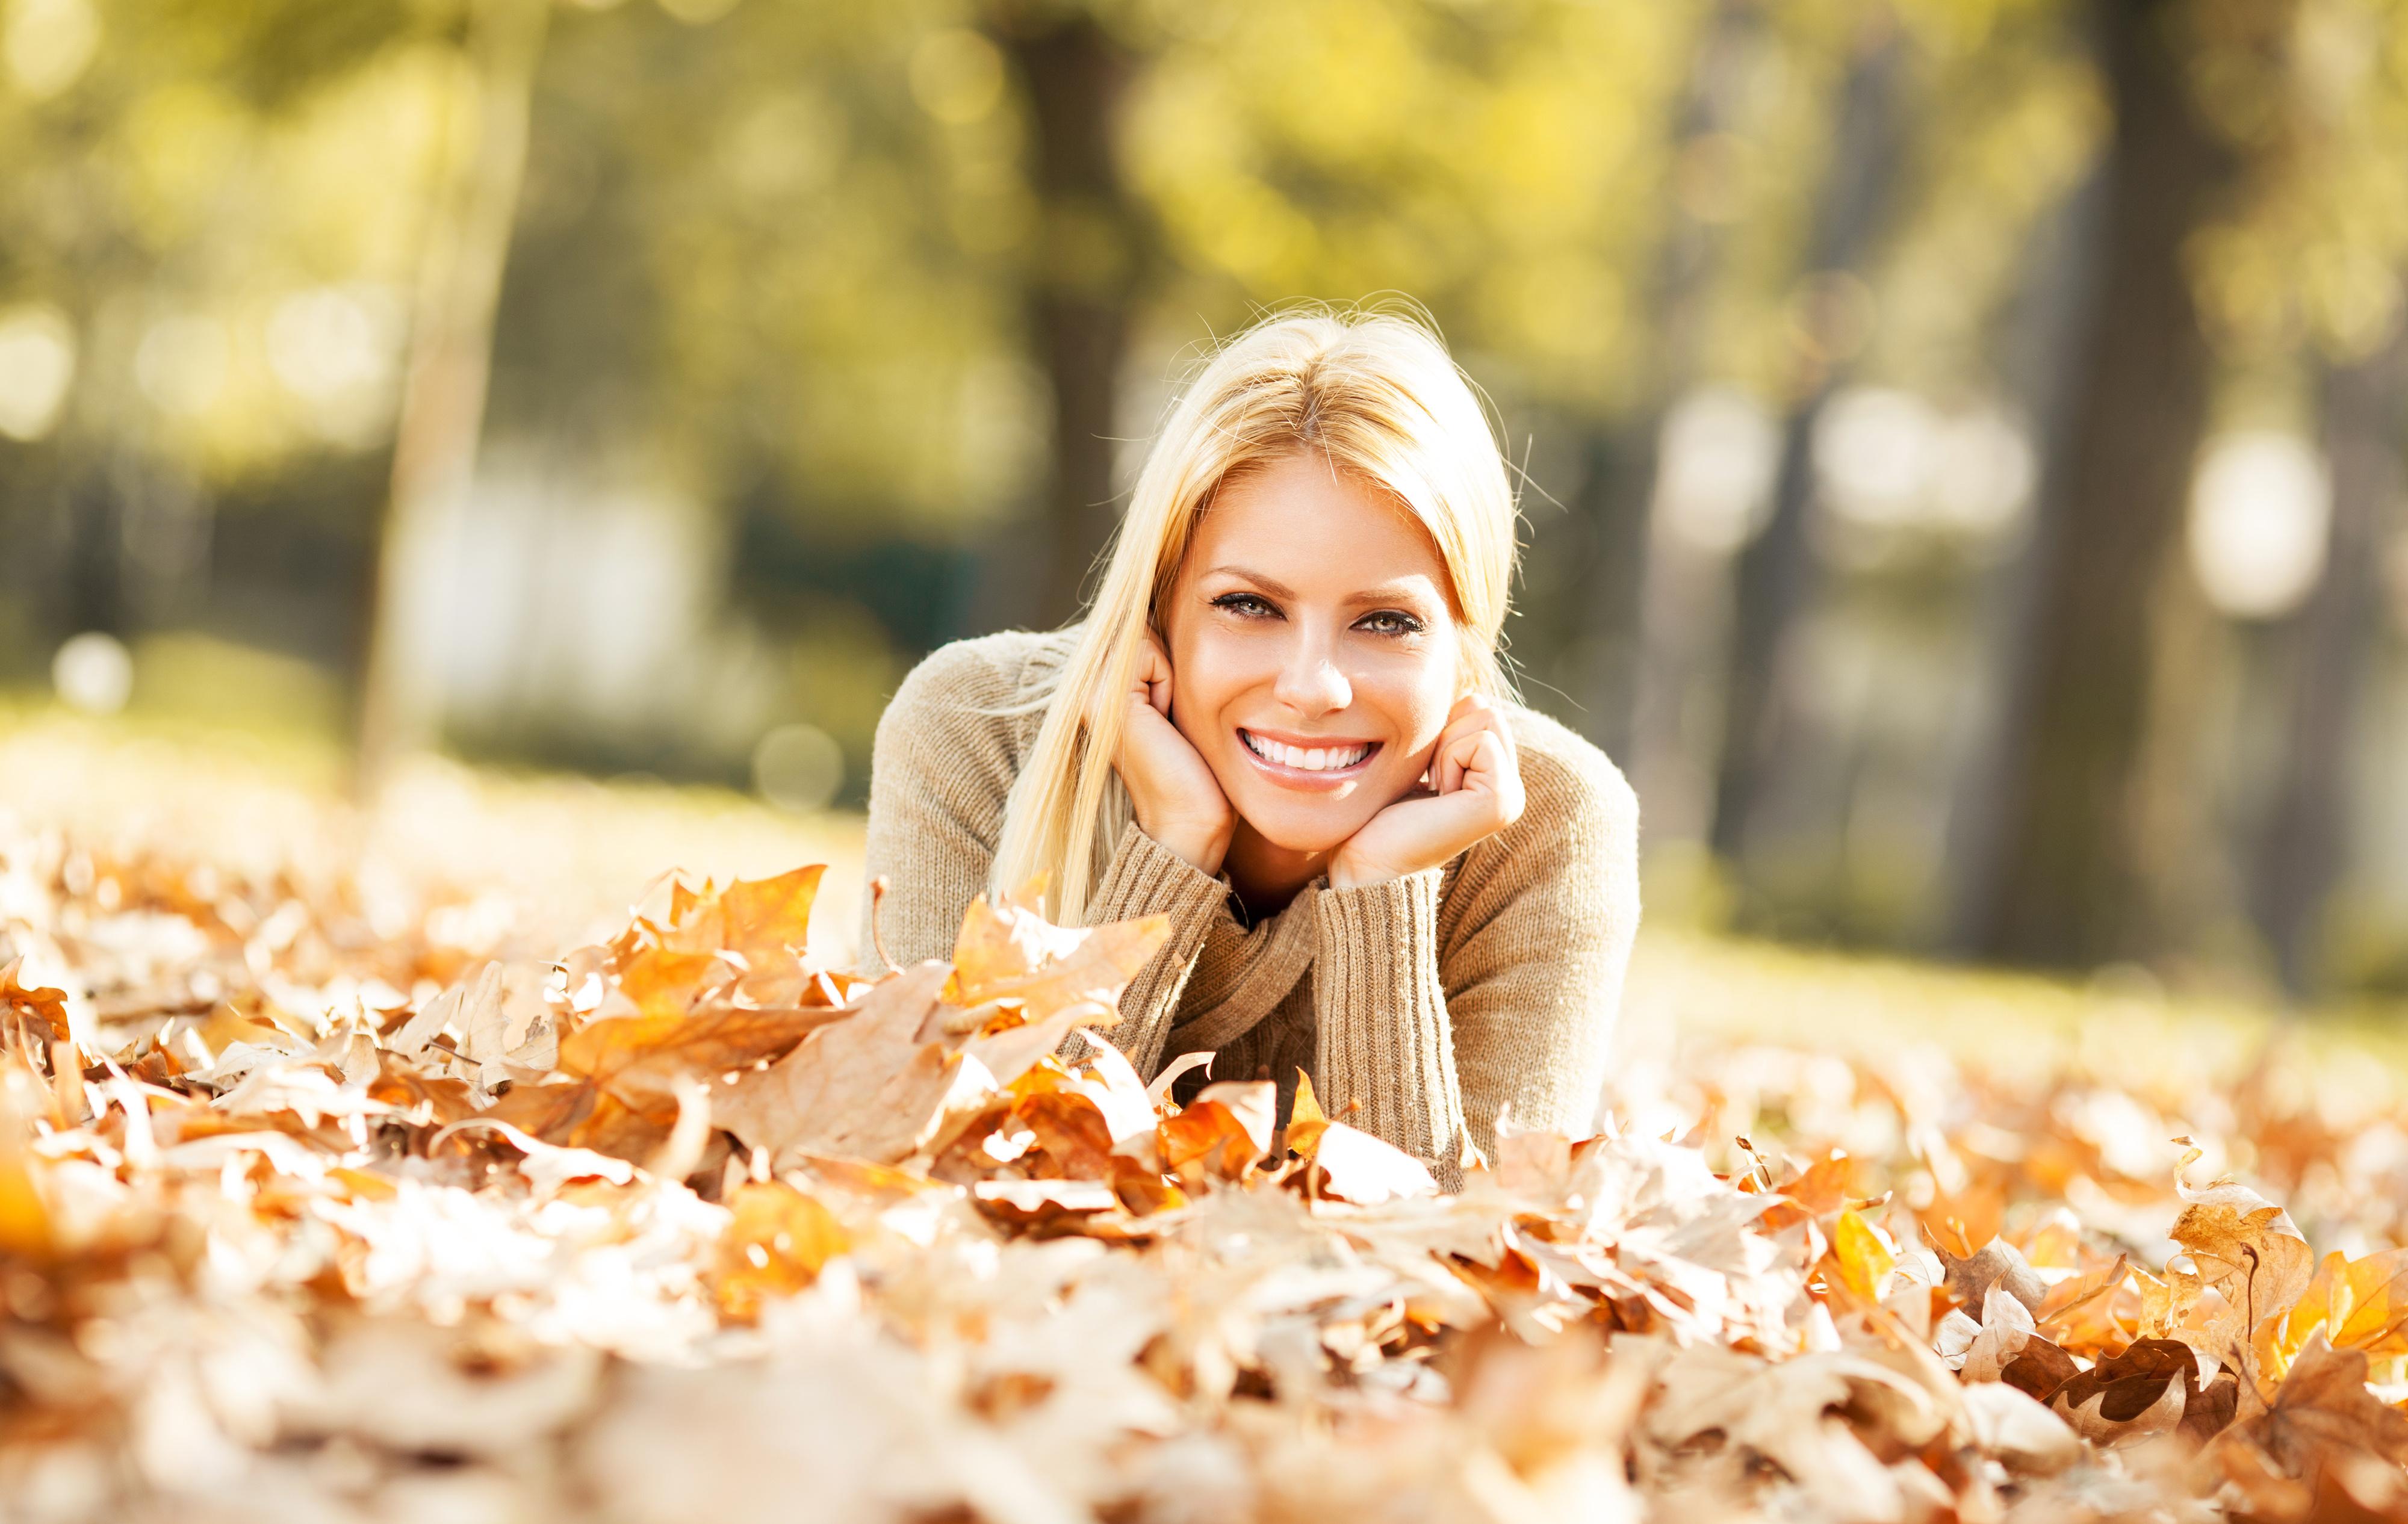 Woman Girl Blonde Smile Depth Of Field Leaf 4000x2532